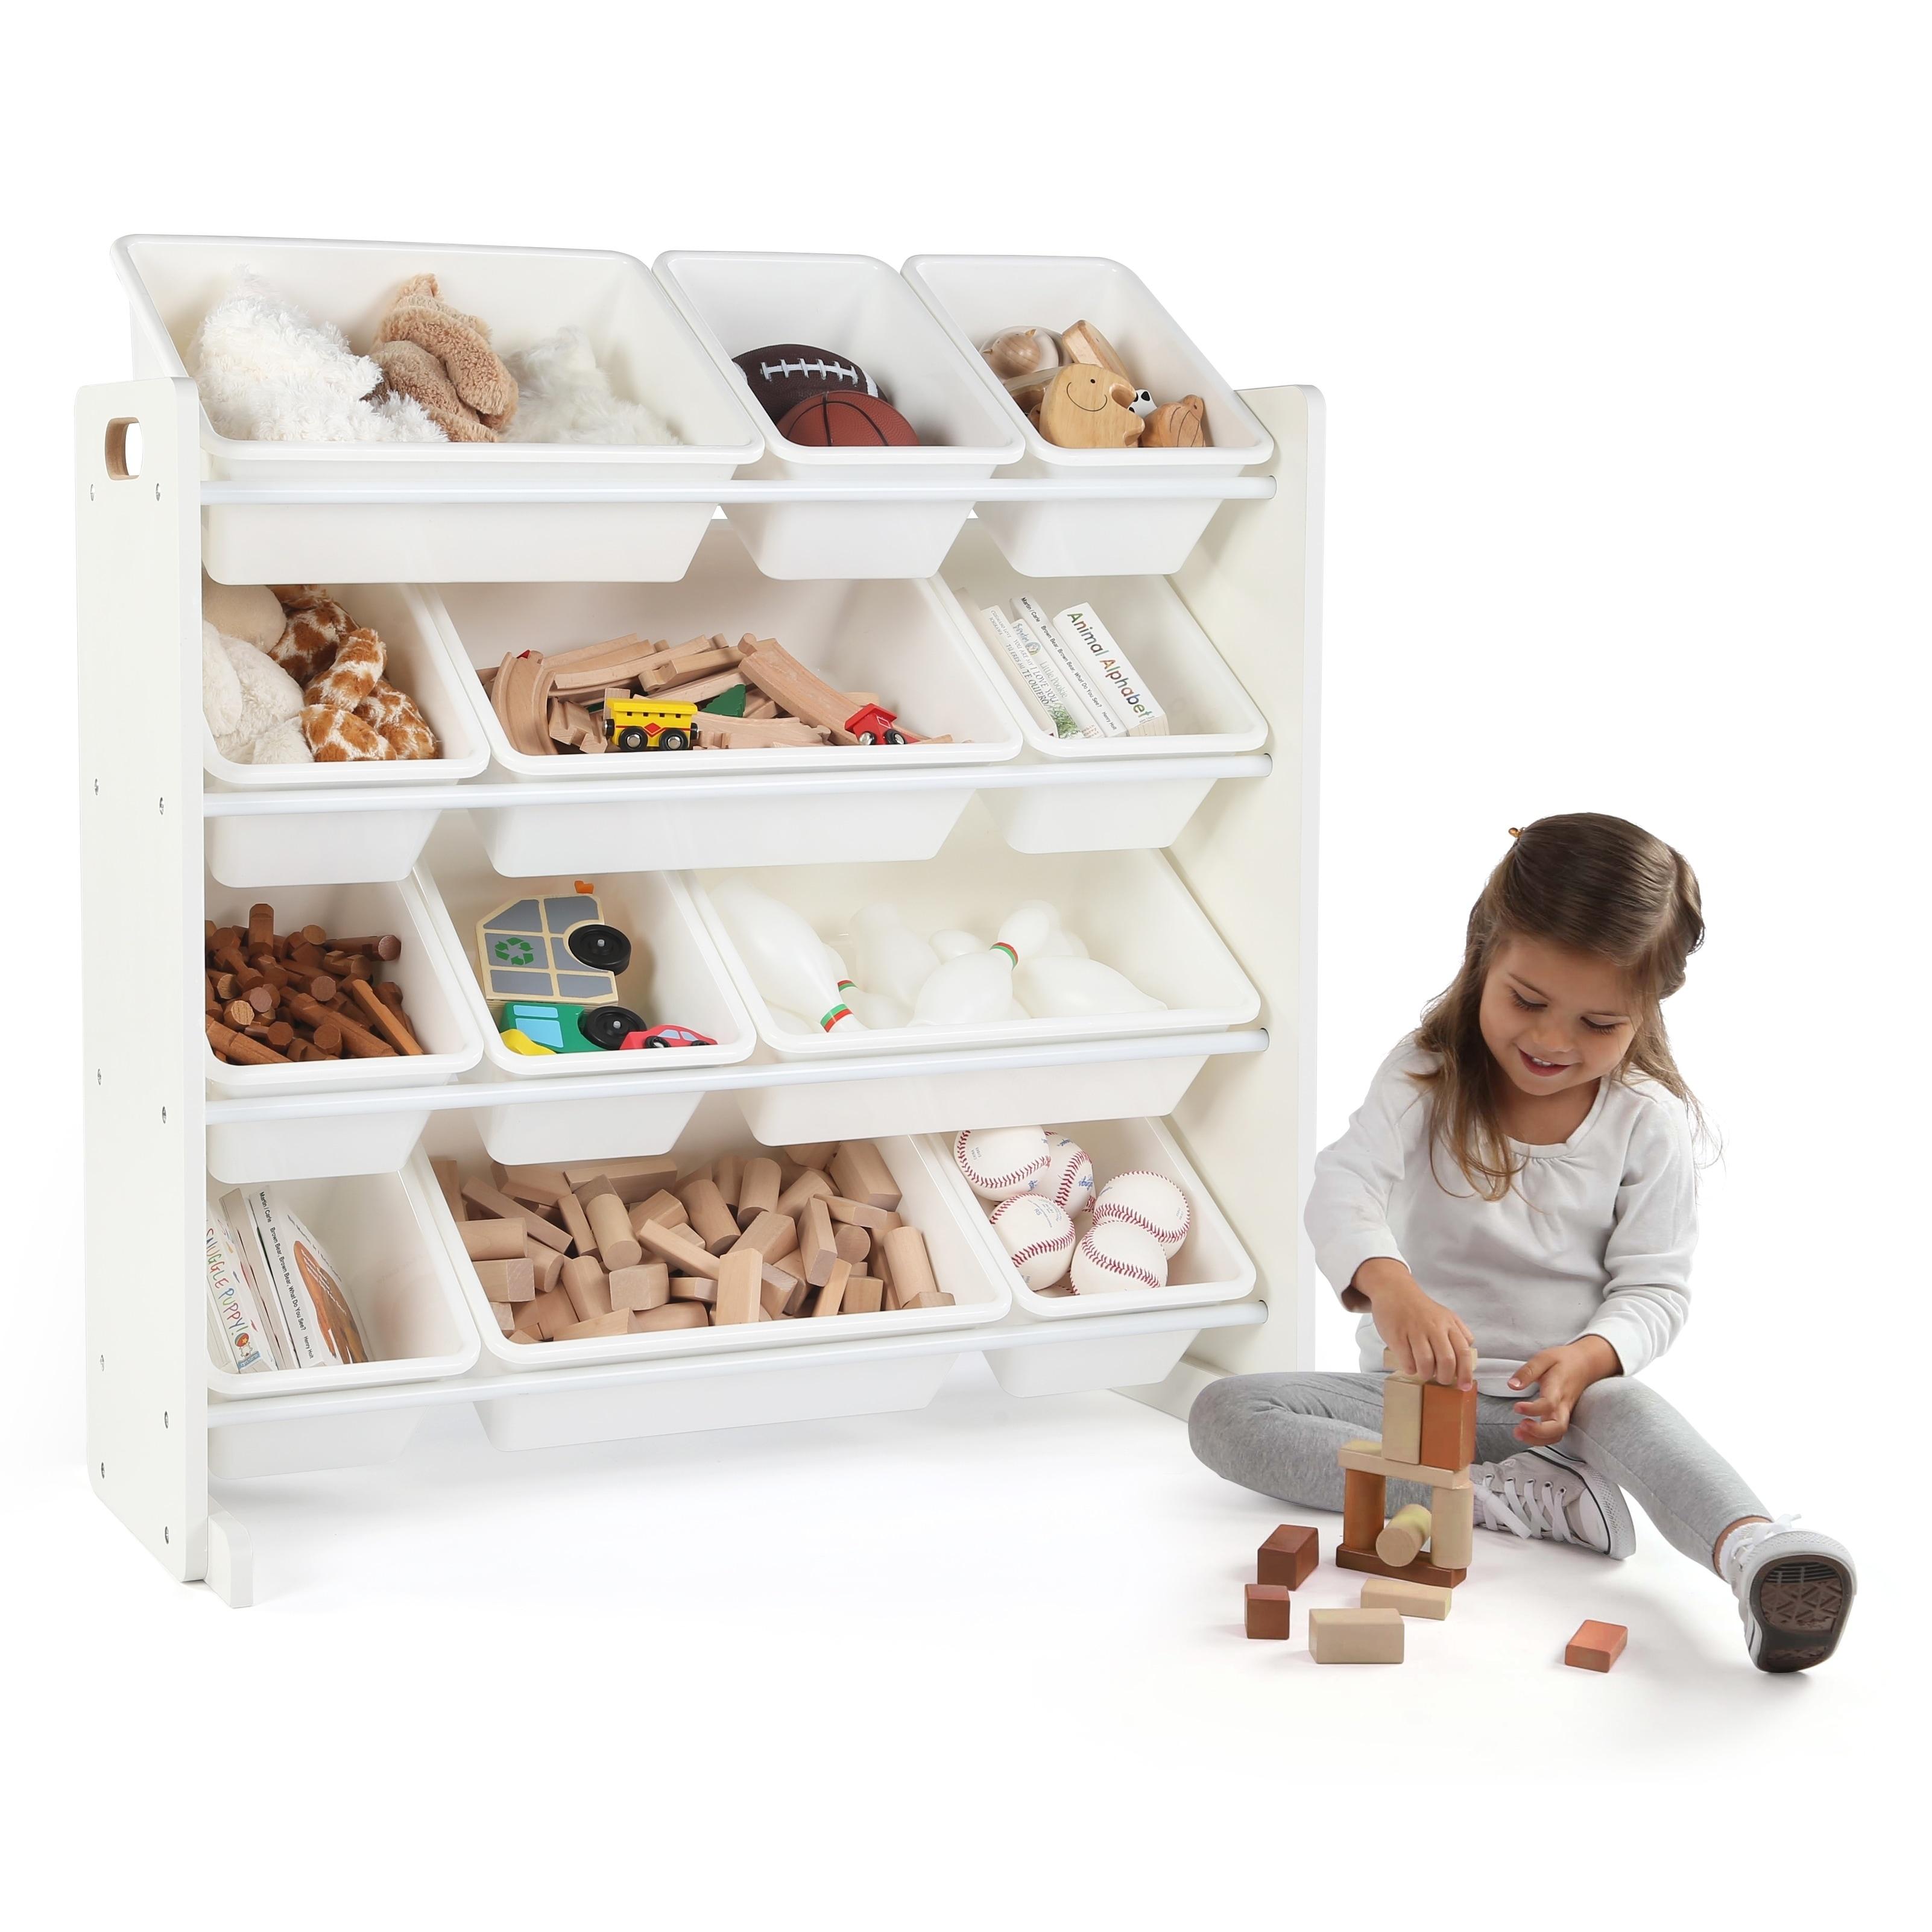 Cambridge Kids BinsWhitewhite Storage 12 Organizer Toy Plastic W D9H2EYWI